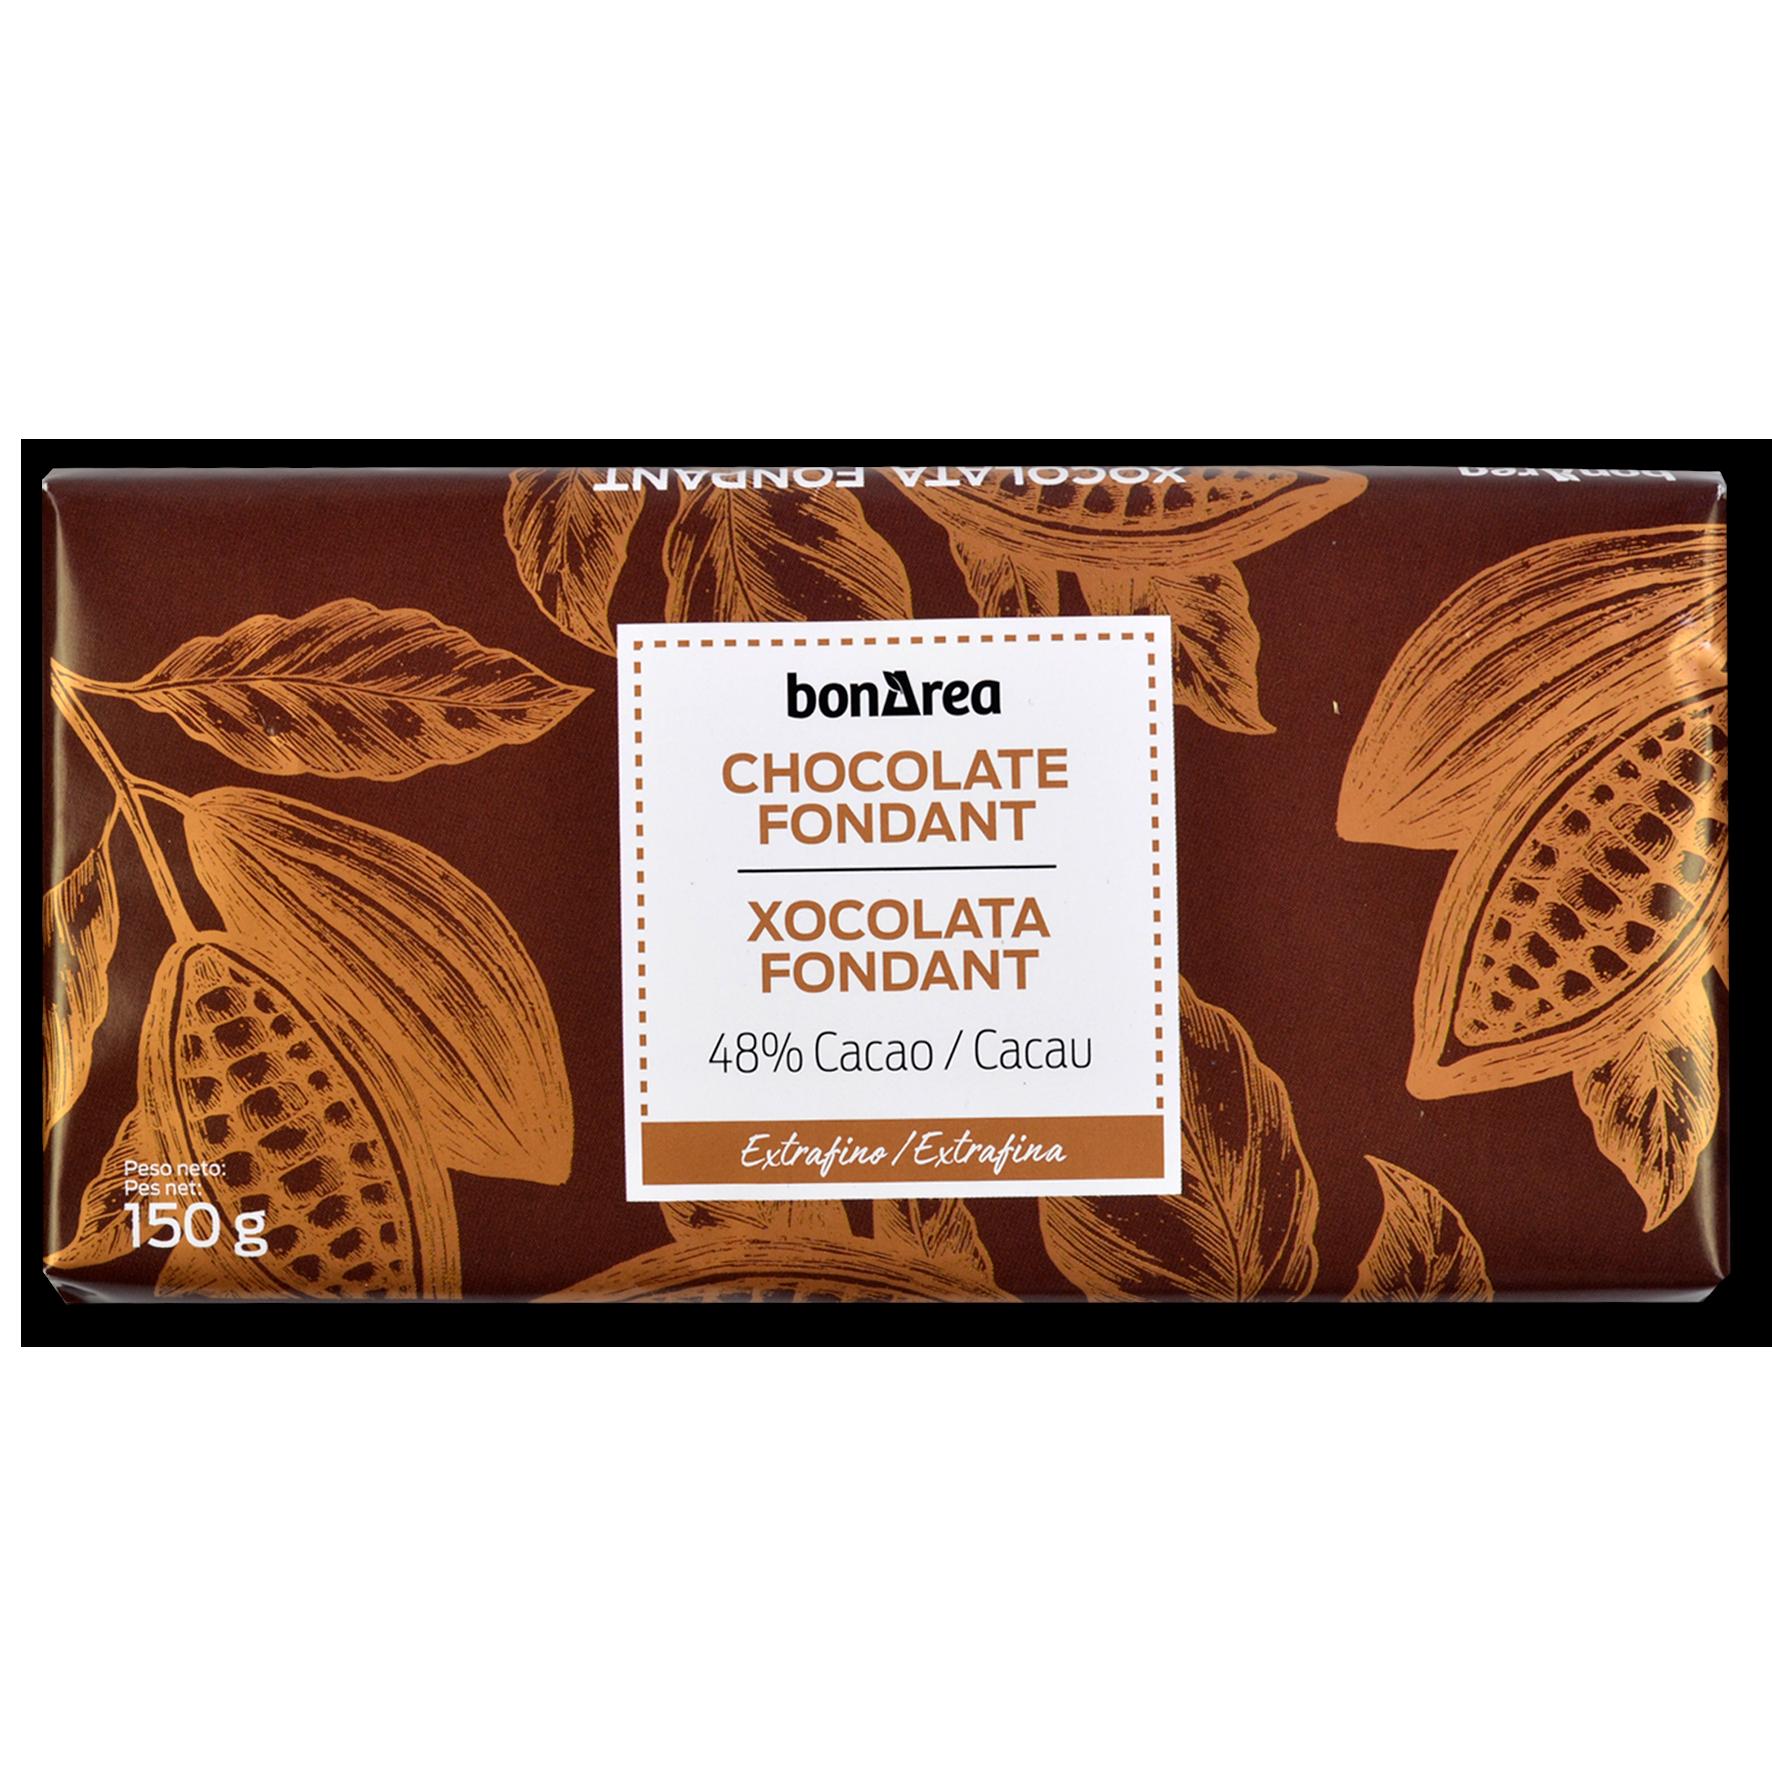 Xocolata foundant tauleta